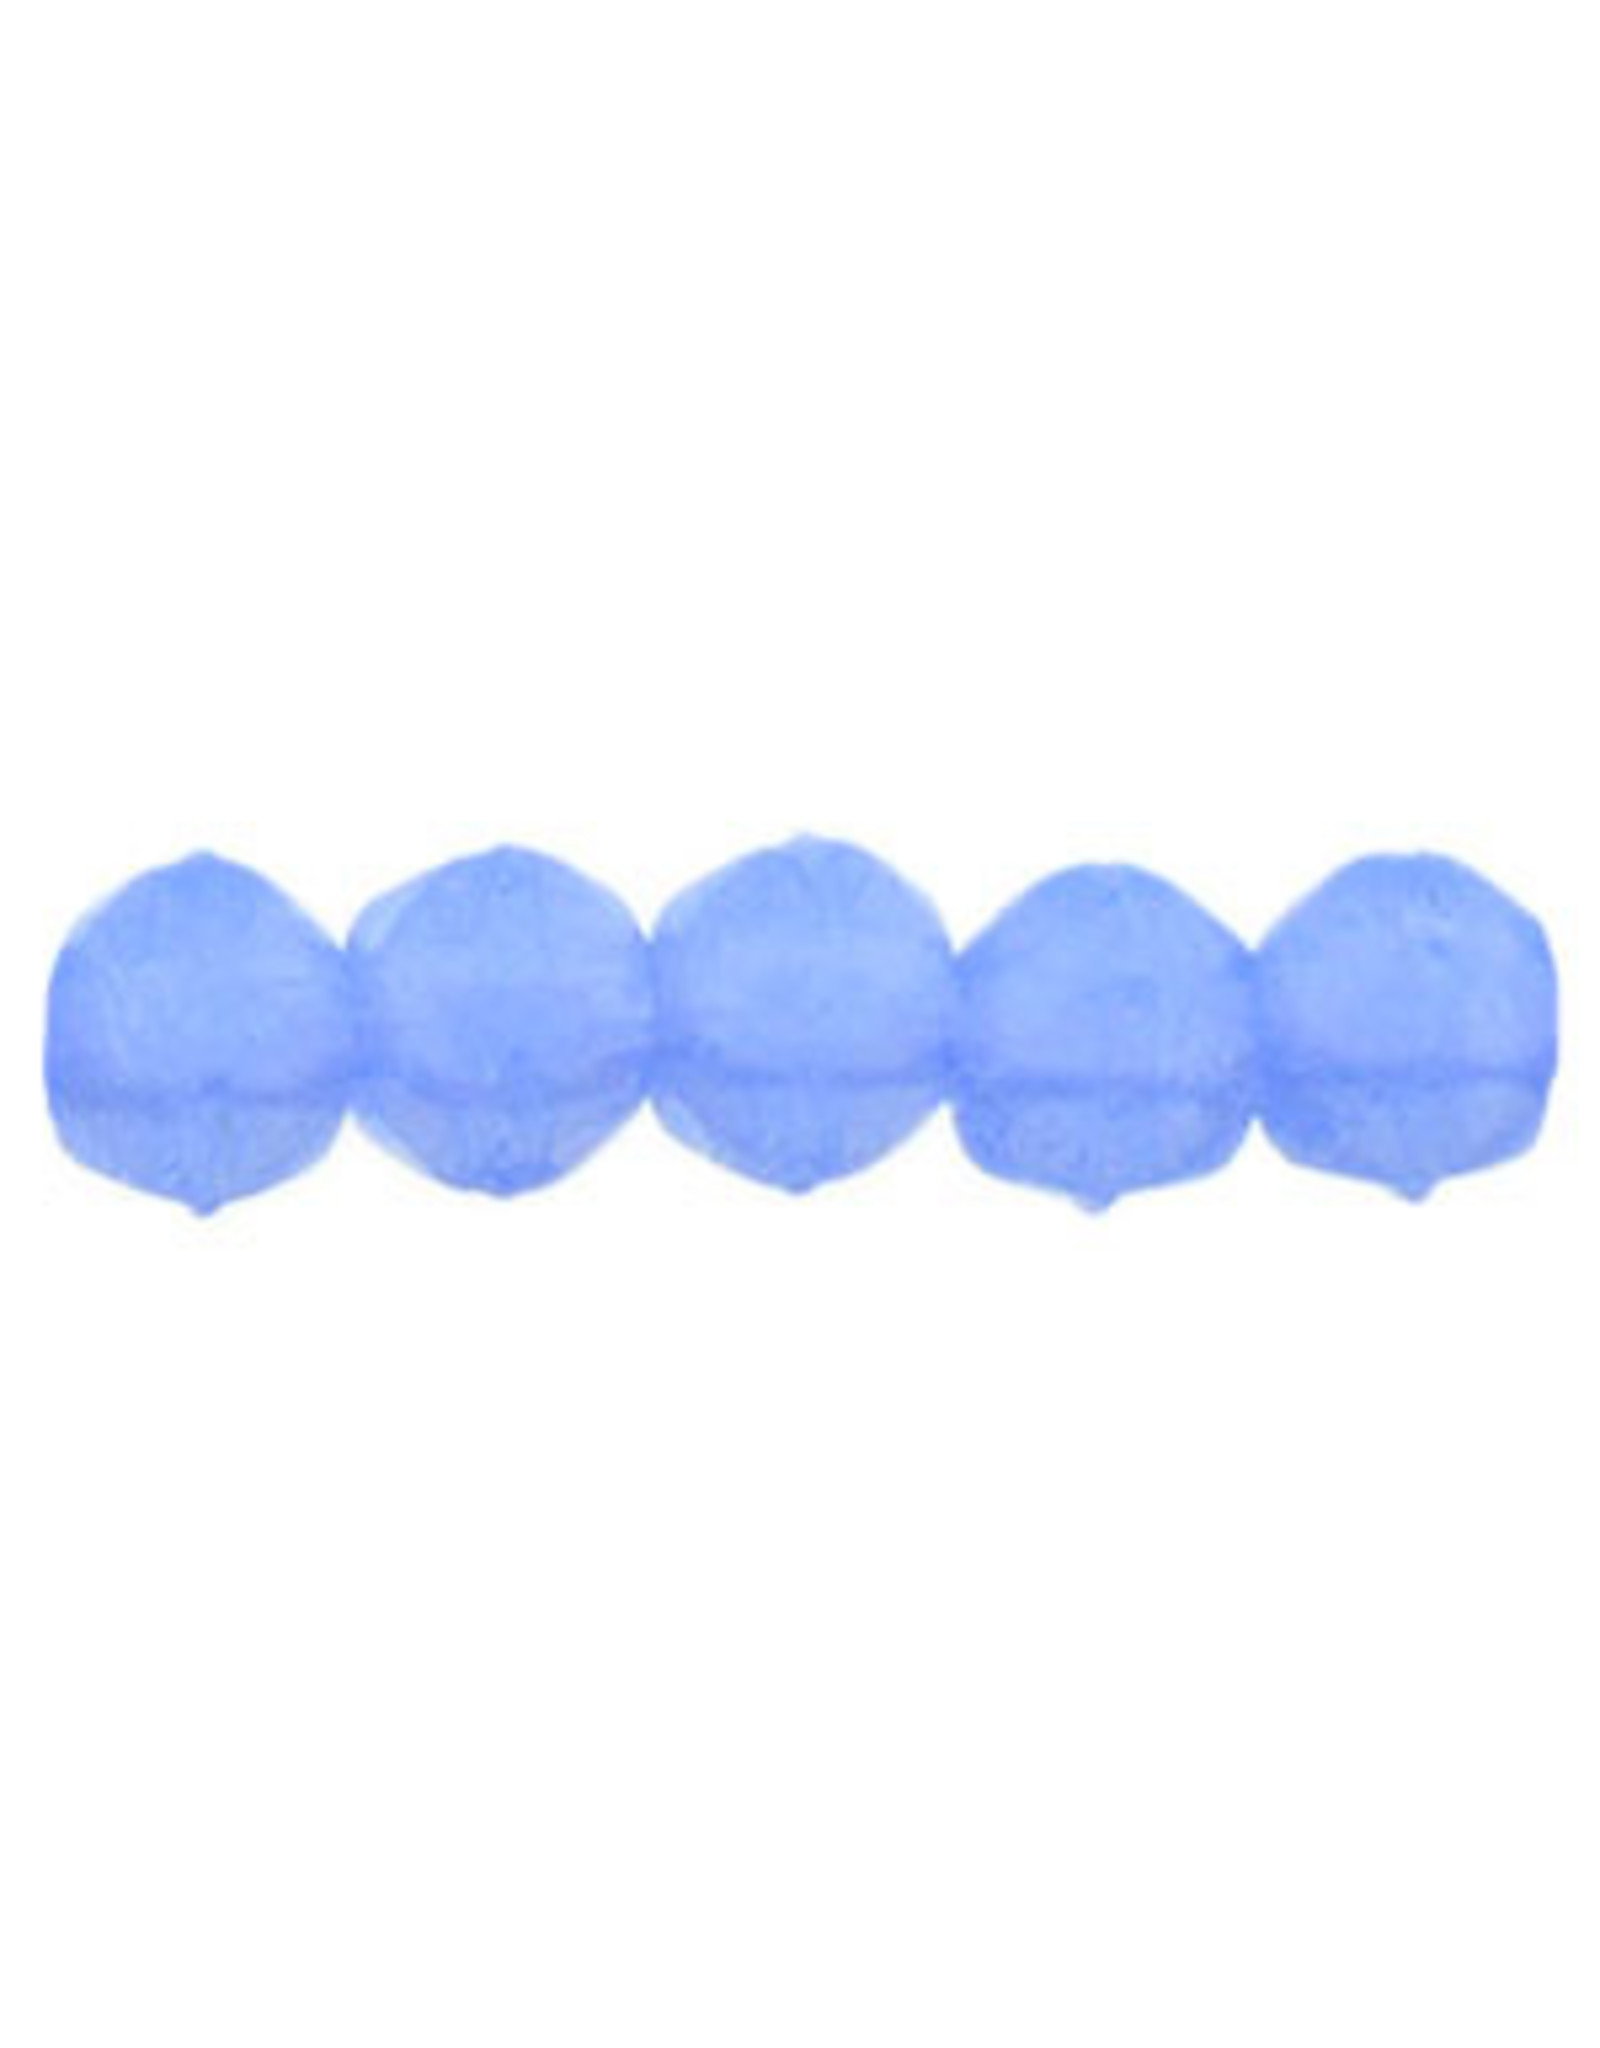 31010 3mm English Cut Milky Sapphire Blue  x50